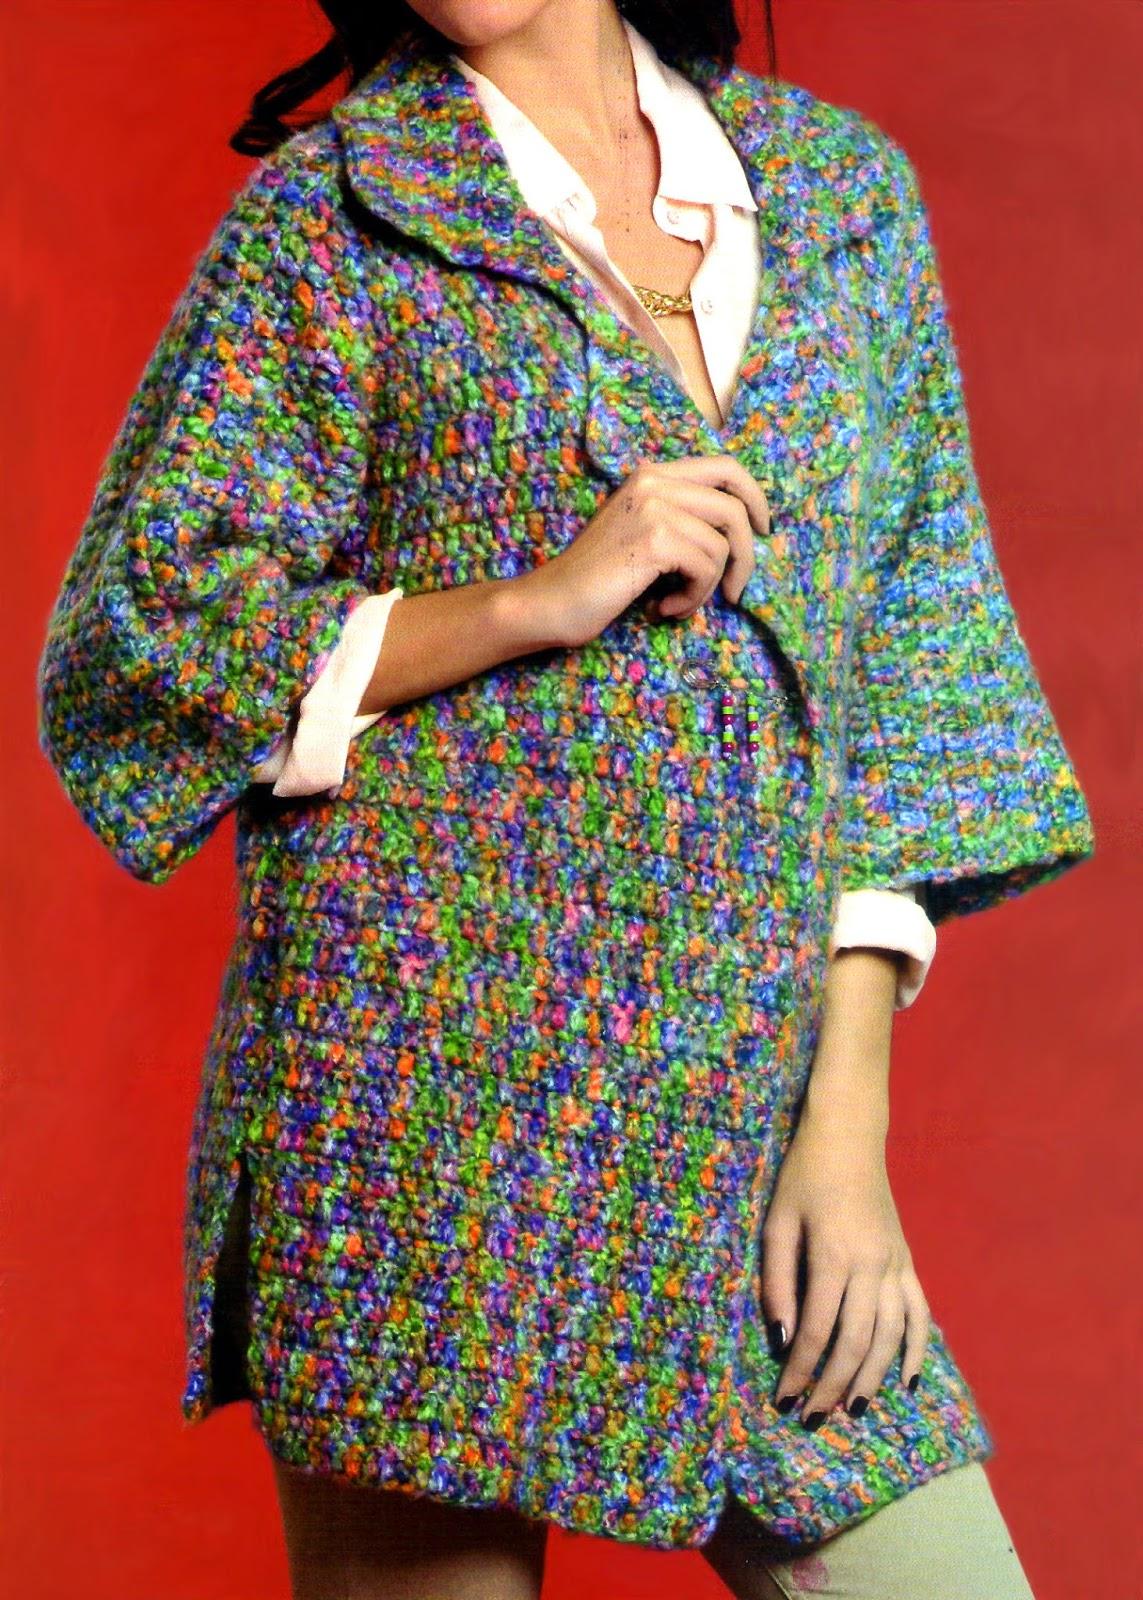 tejidos al crochet paso a paso con diagramas: kimono tejido a ...